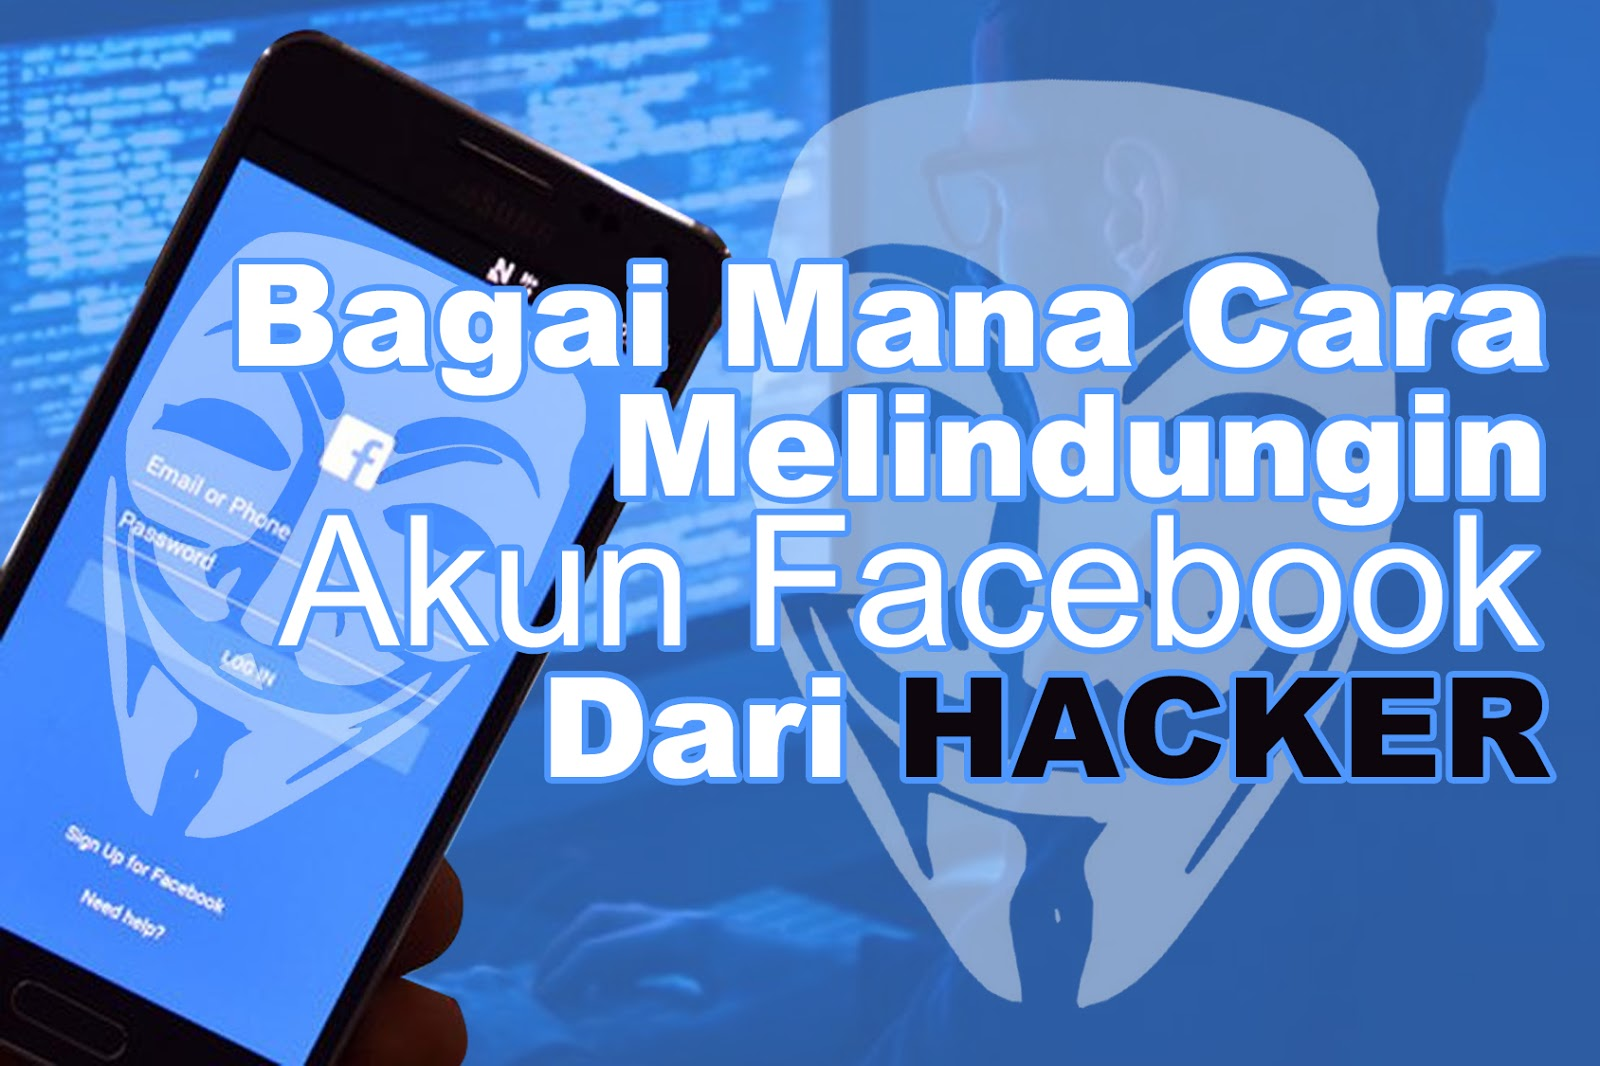 Bagai Mana Cara Melindungin Akun Facebook dari Hacker